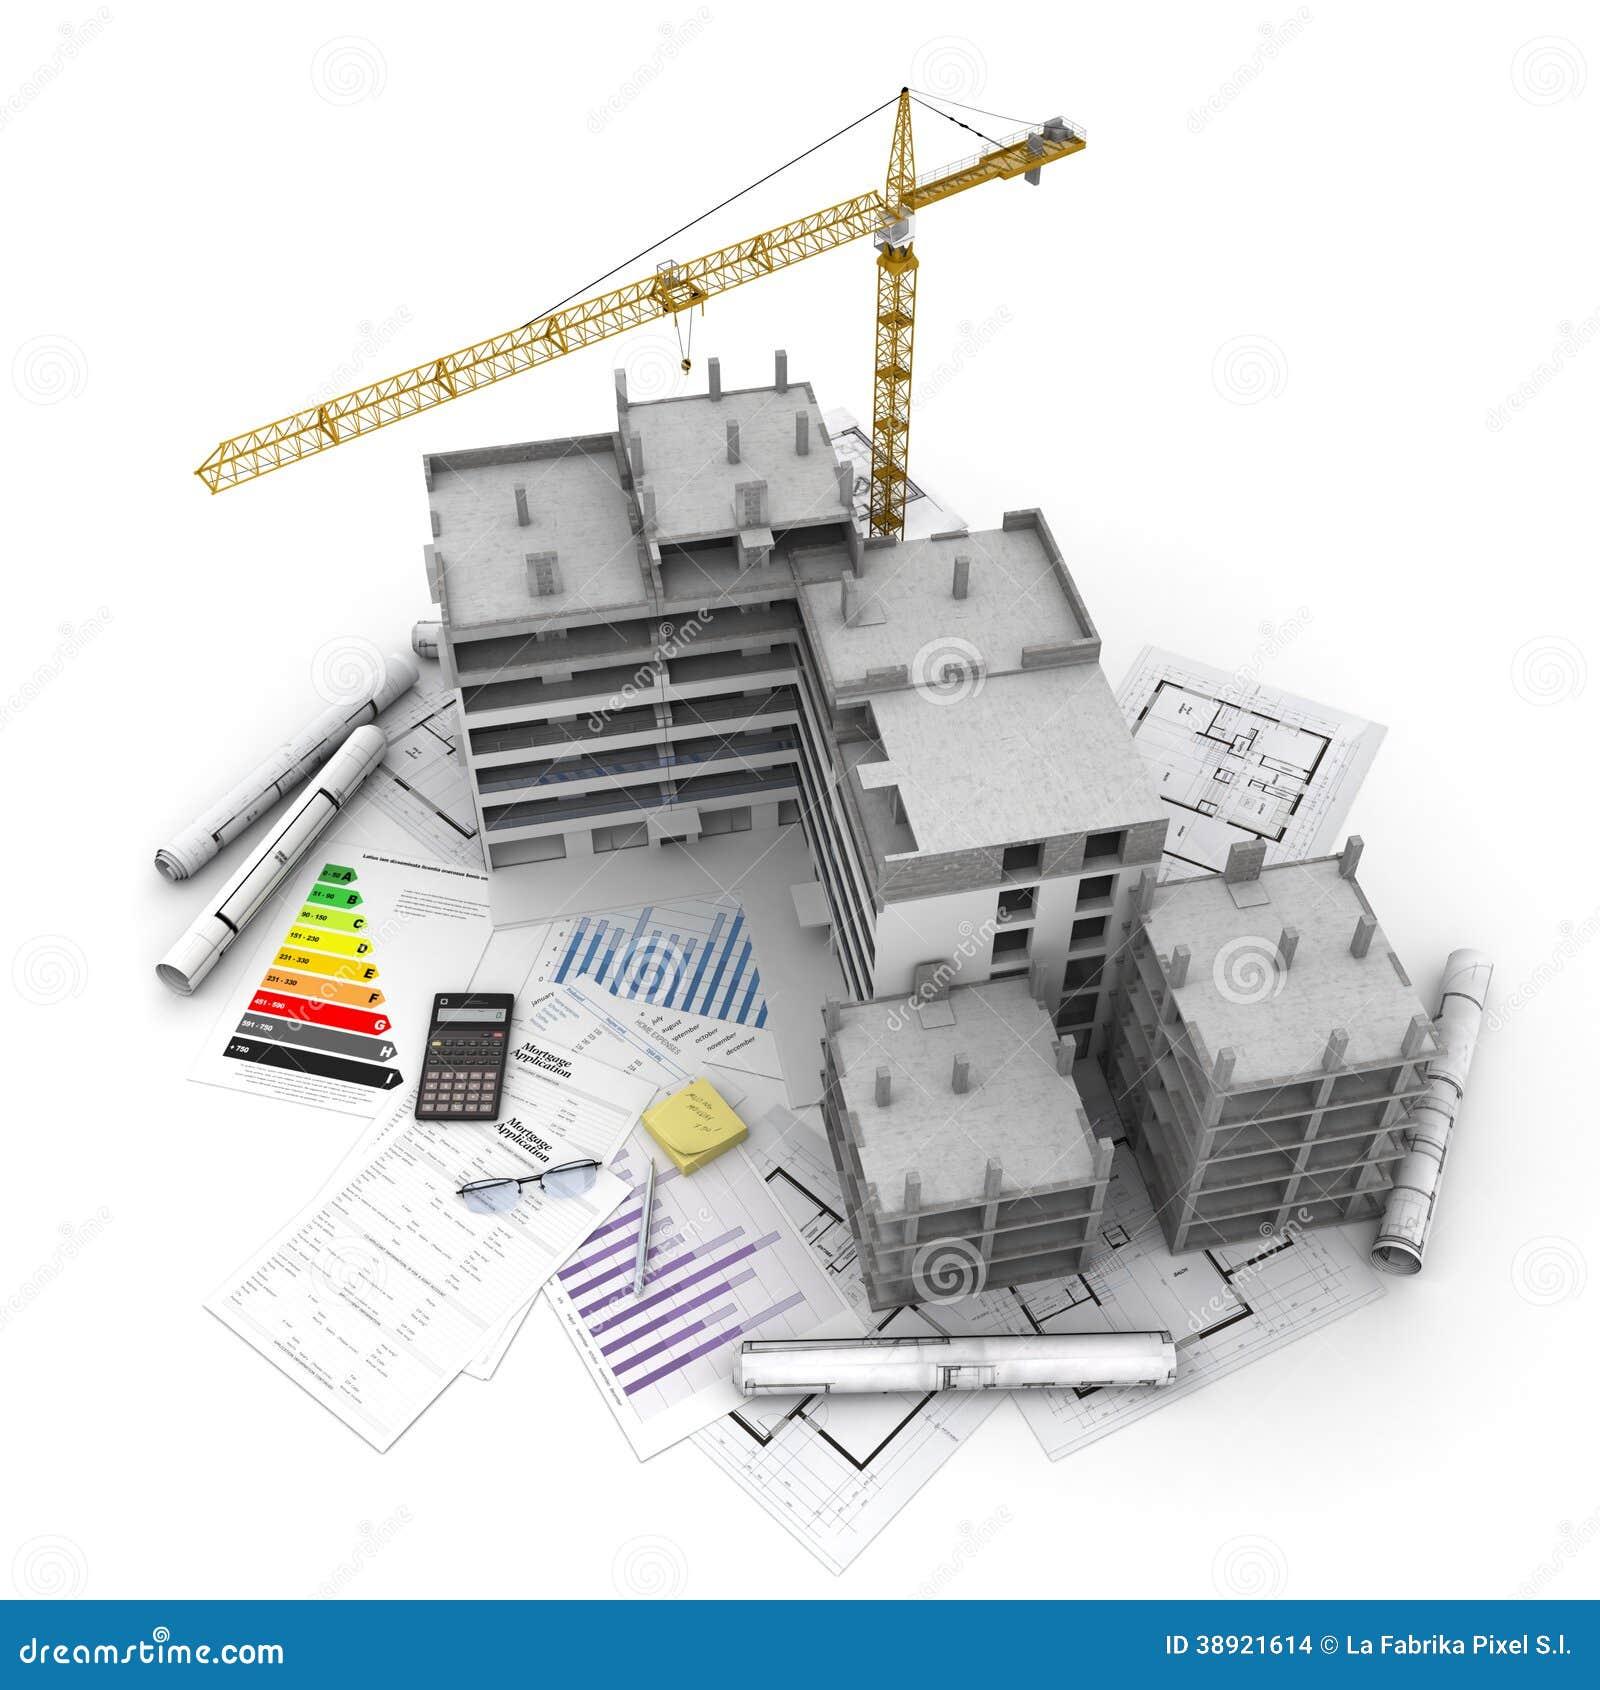 construction estimate by max fajardo pdf